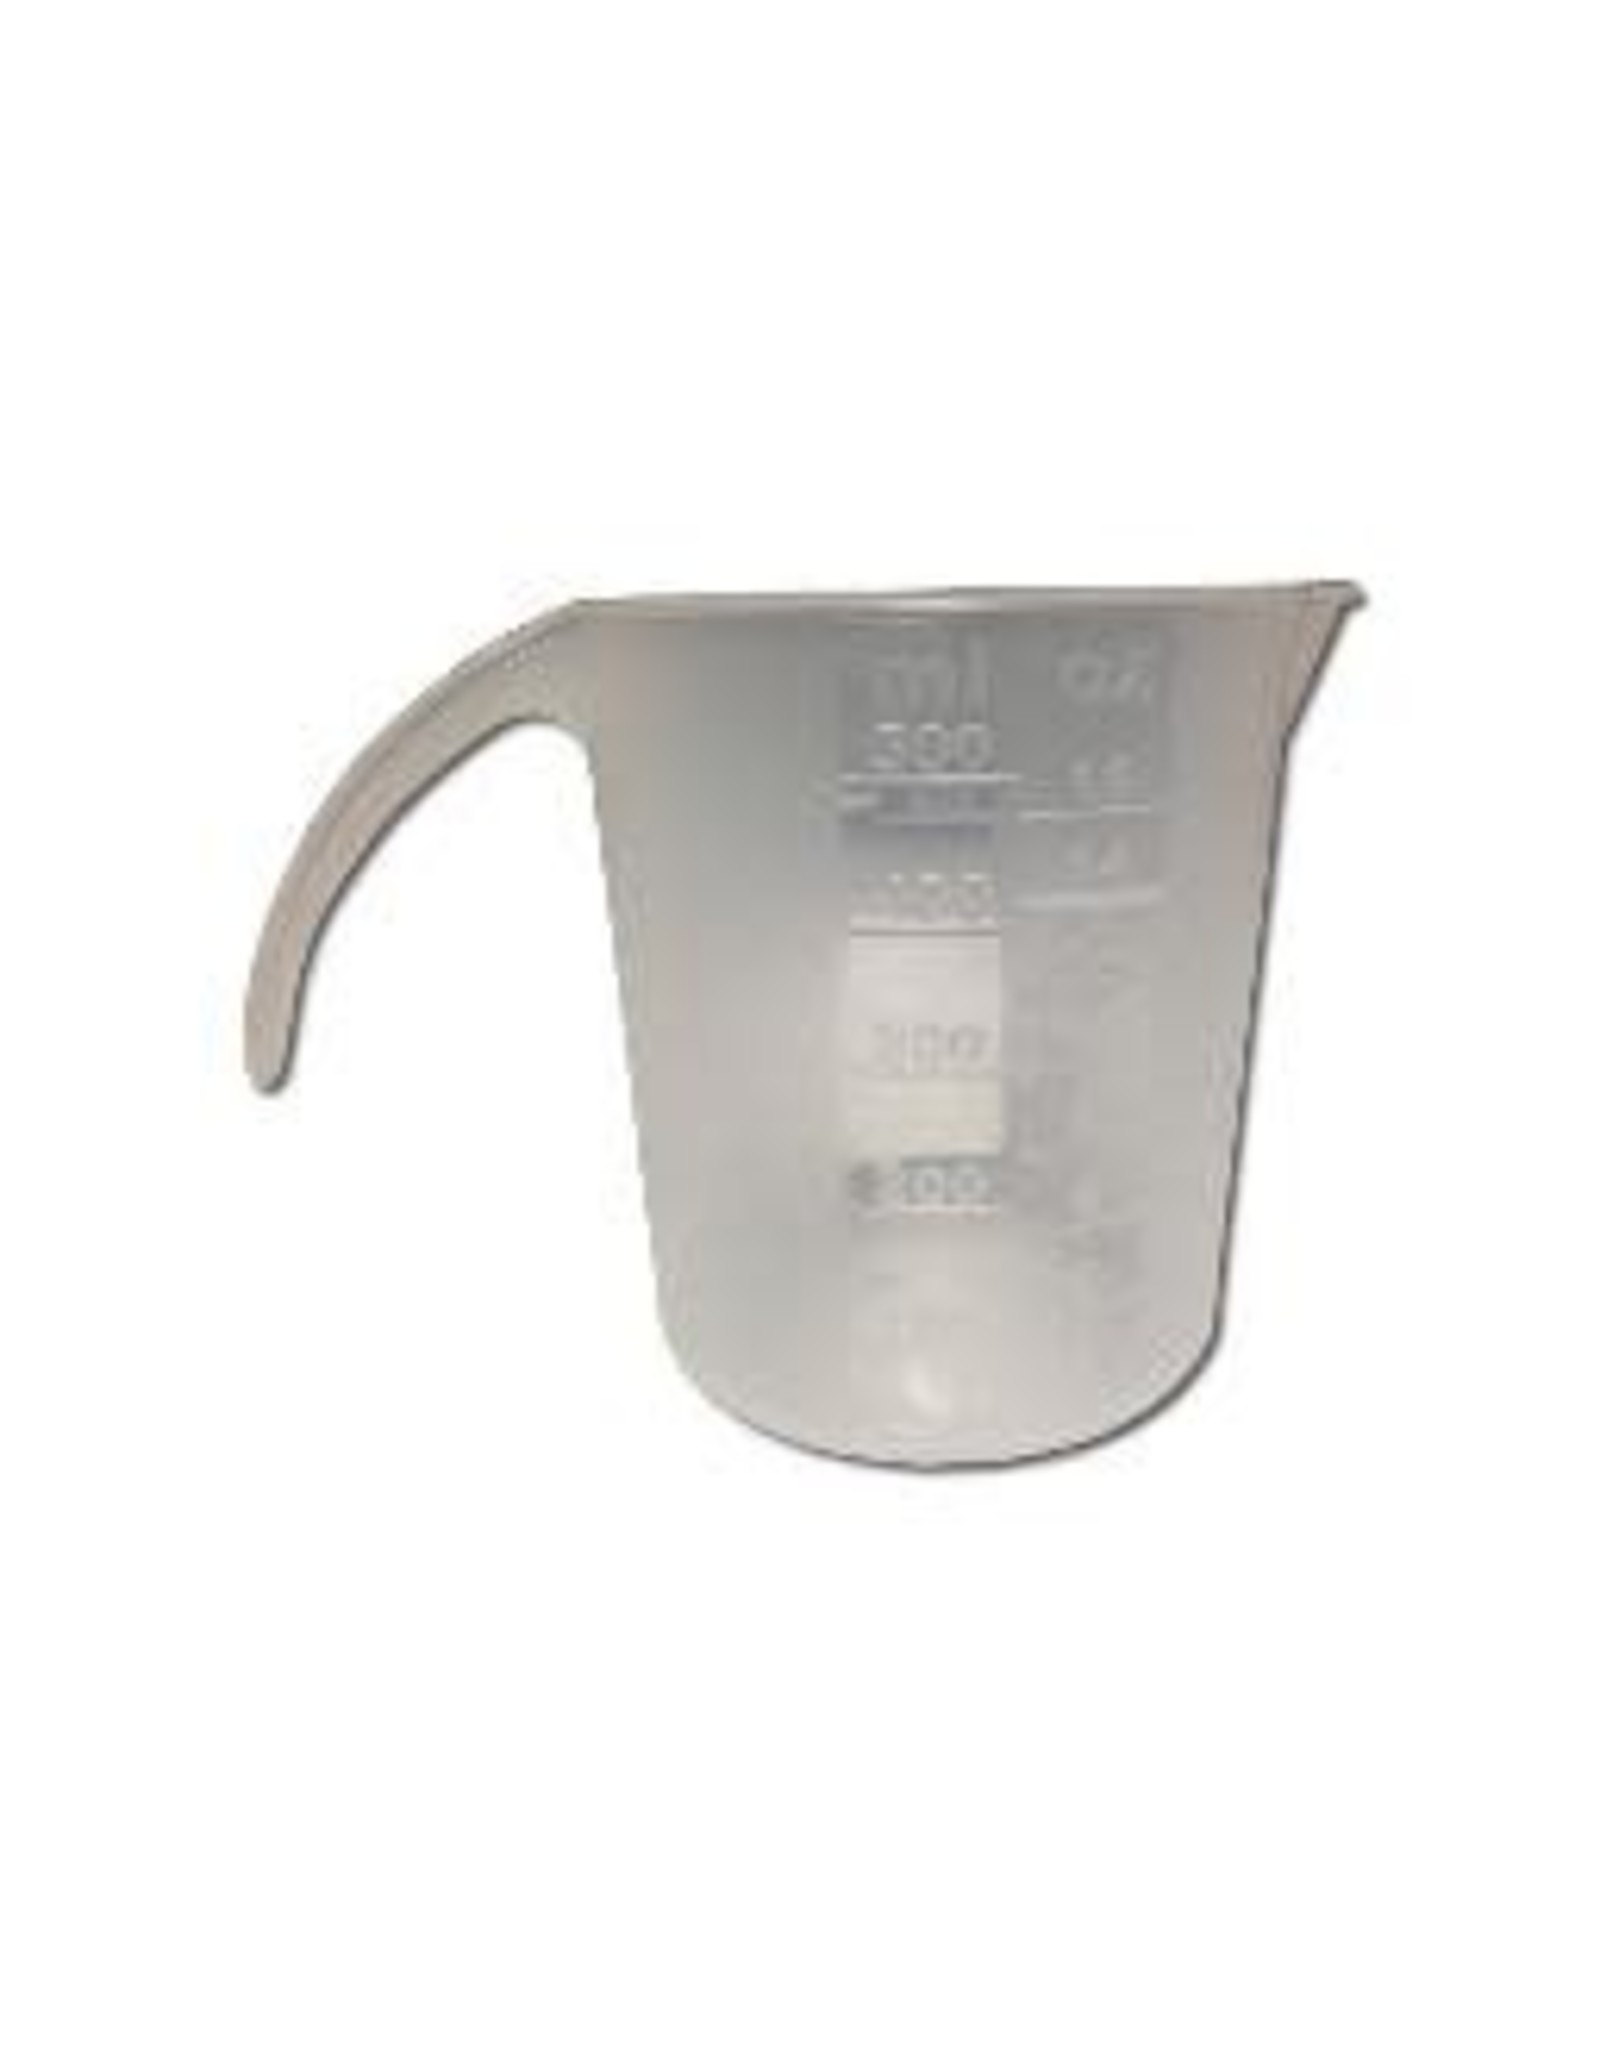 16 OZ PLASTIC MEASURING CUP